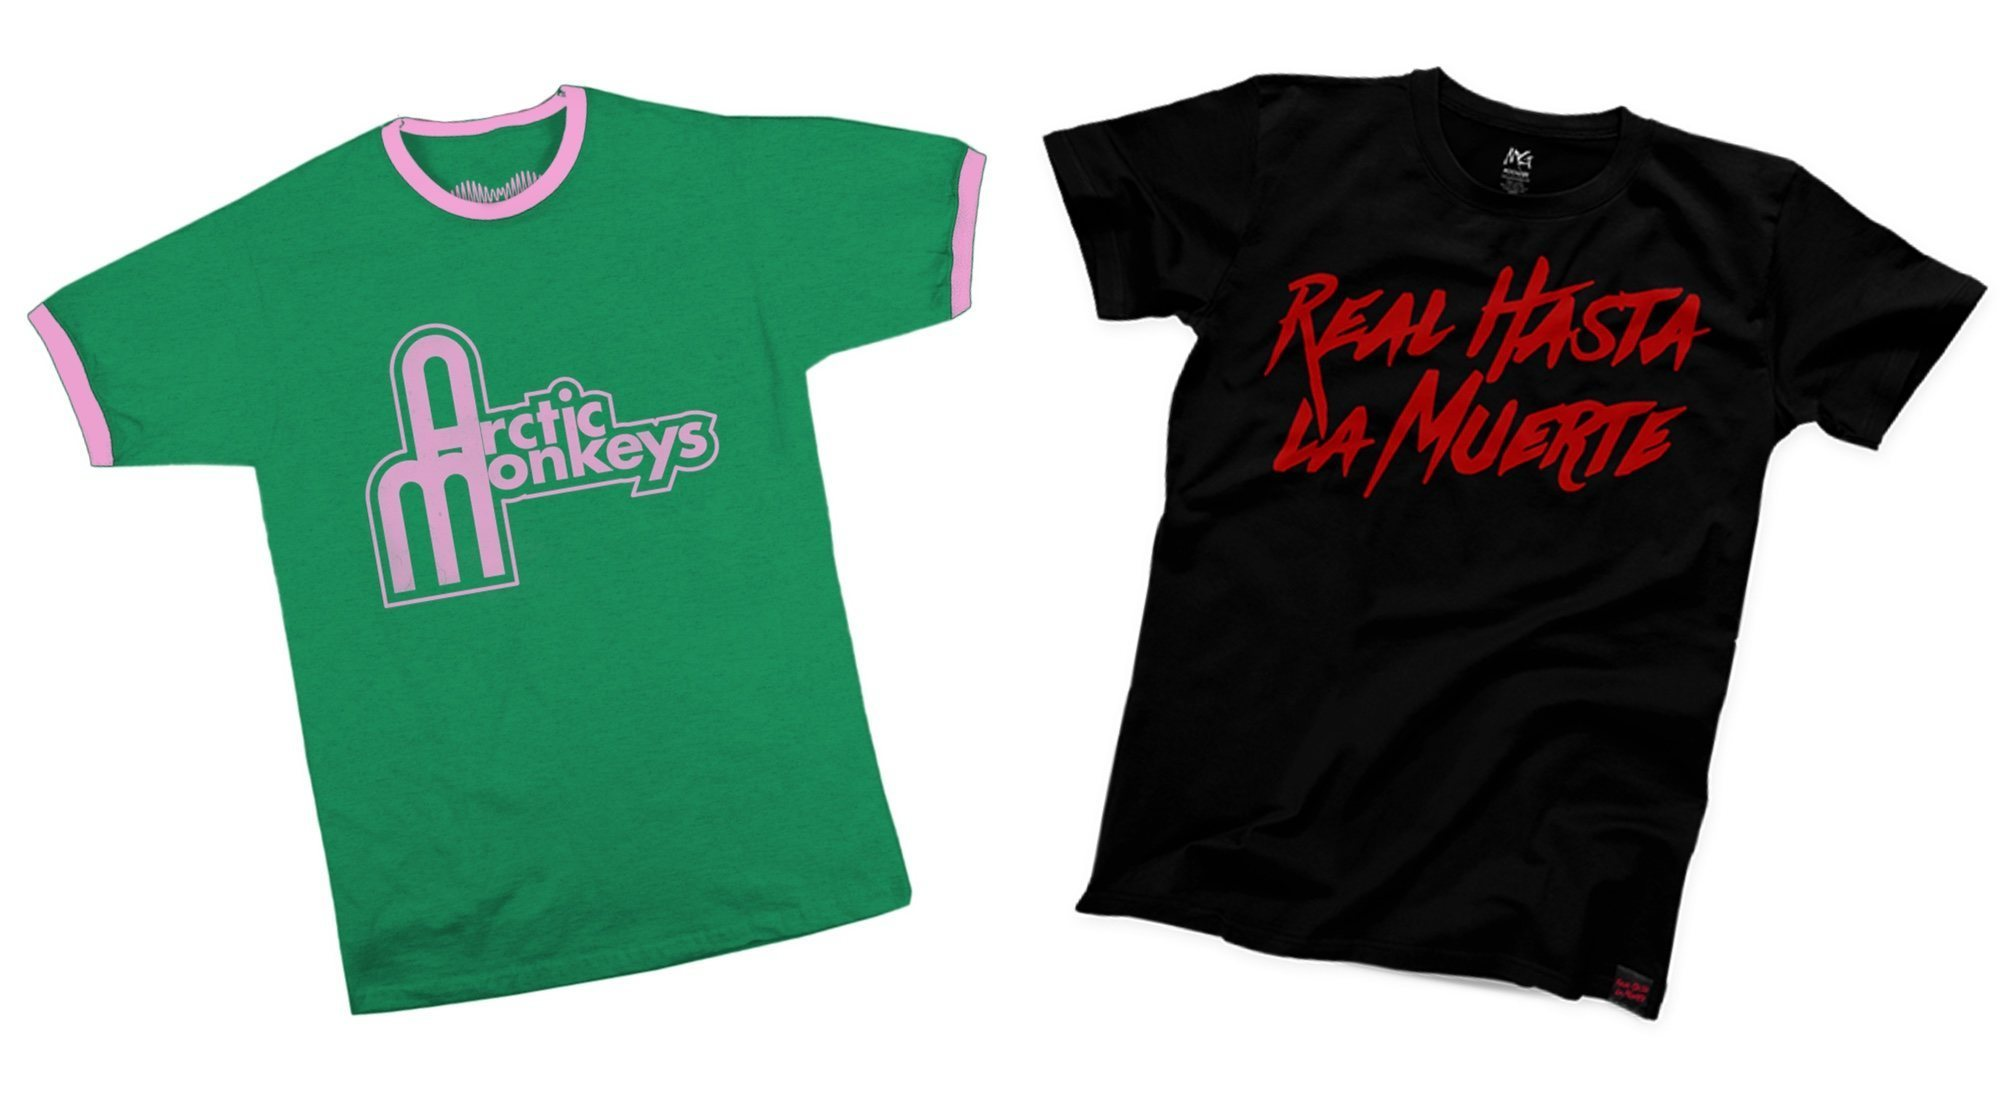 Camisetas icónicas de reggaeton, rap e indie